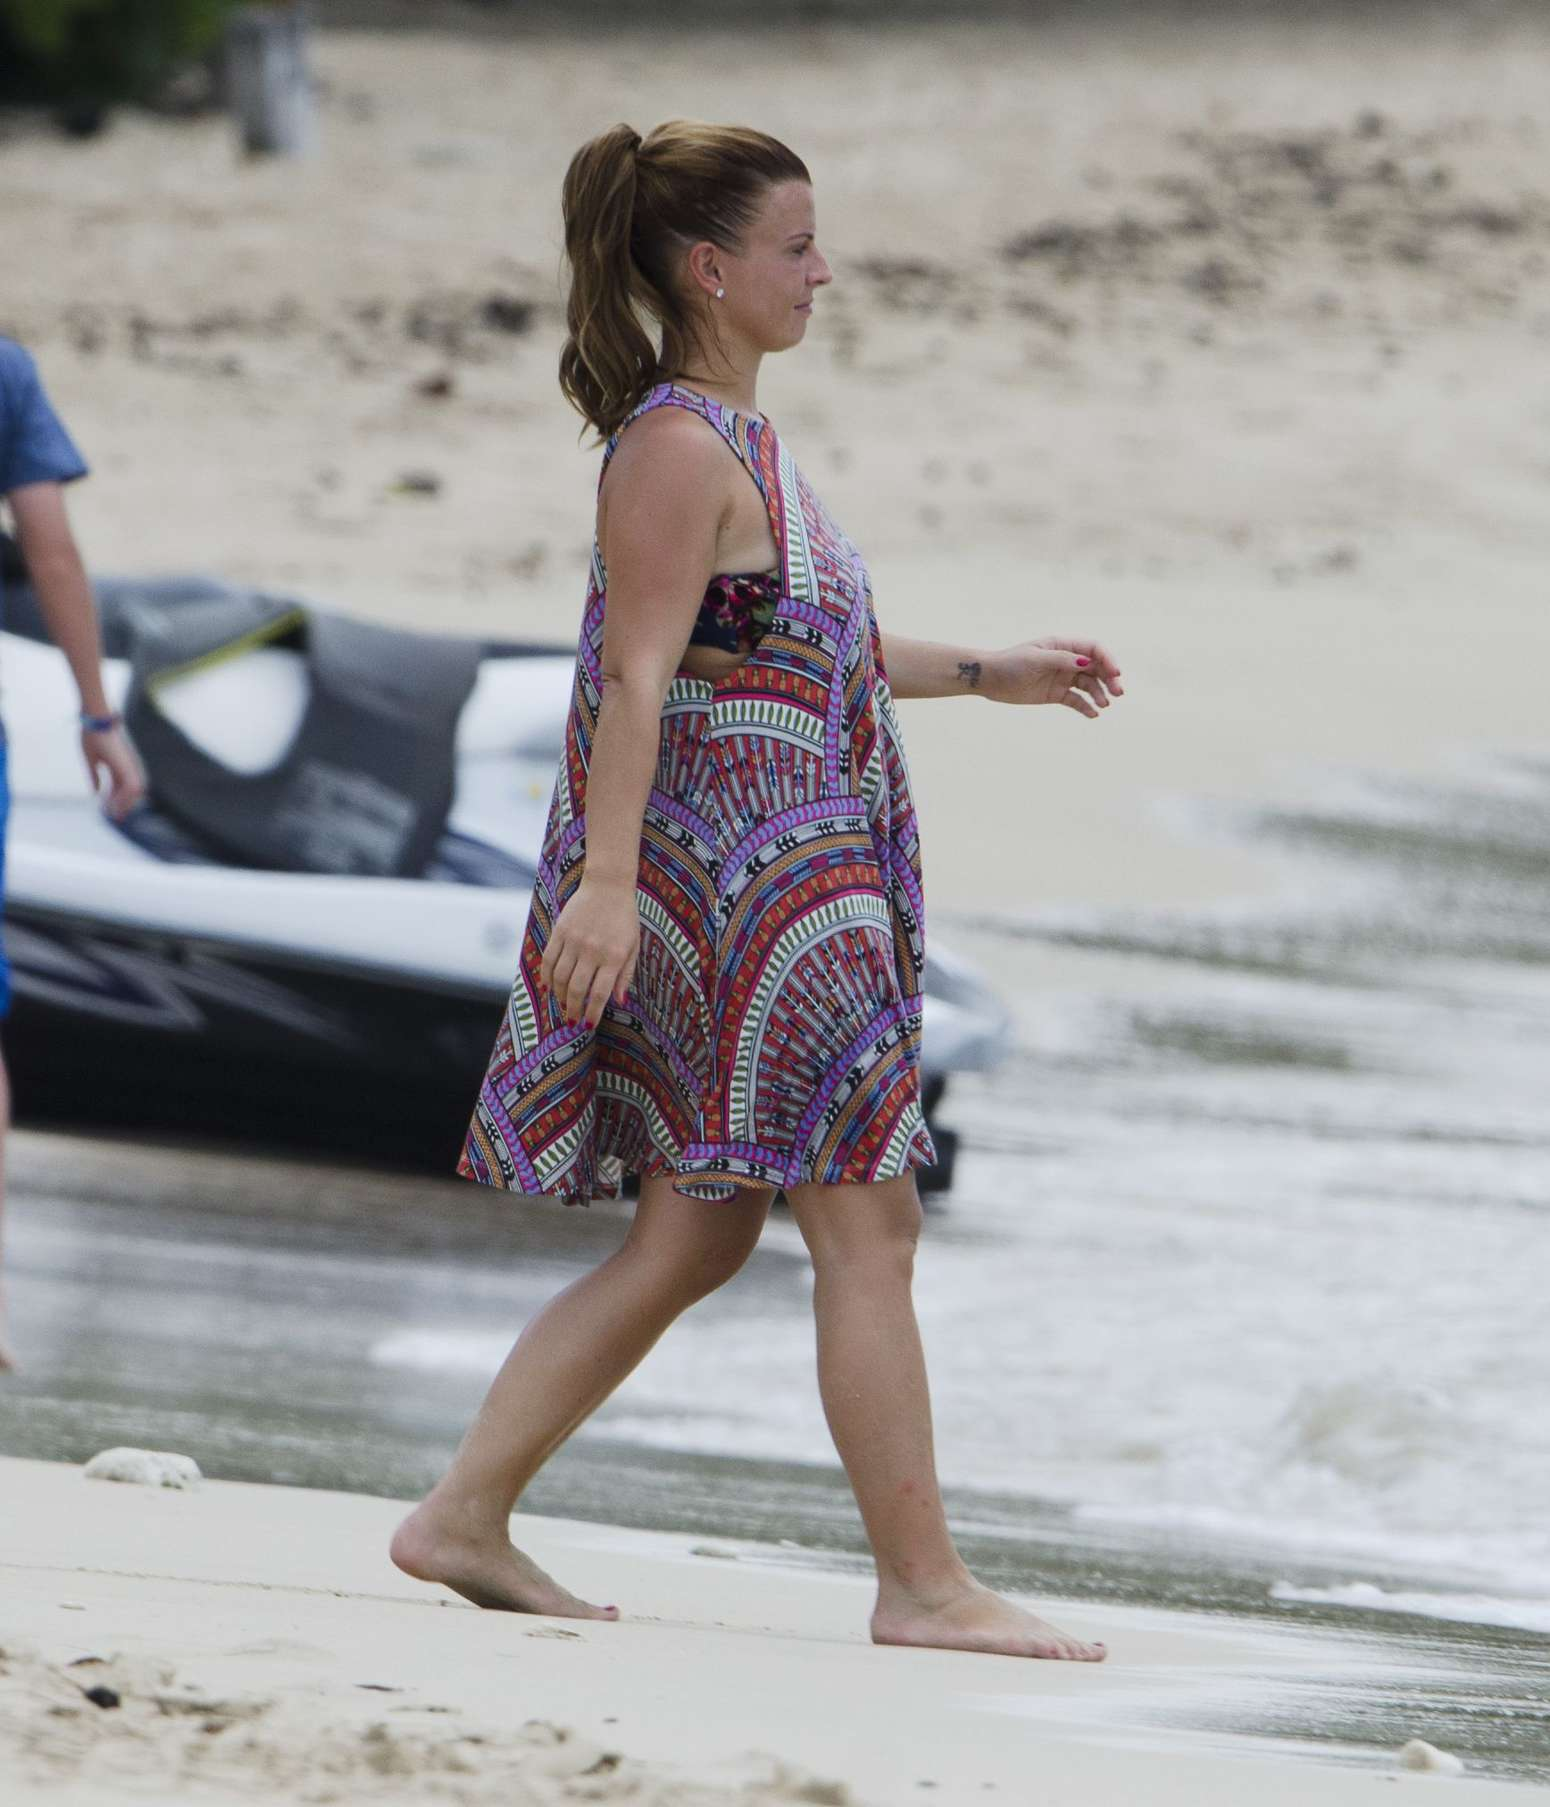 Coleen Rooney Wearing Bikini on the beach while in Barbados